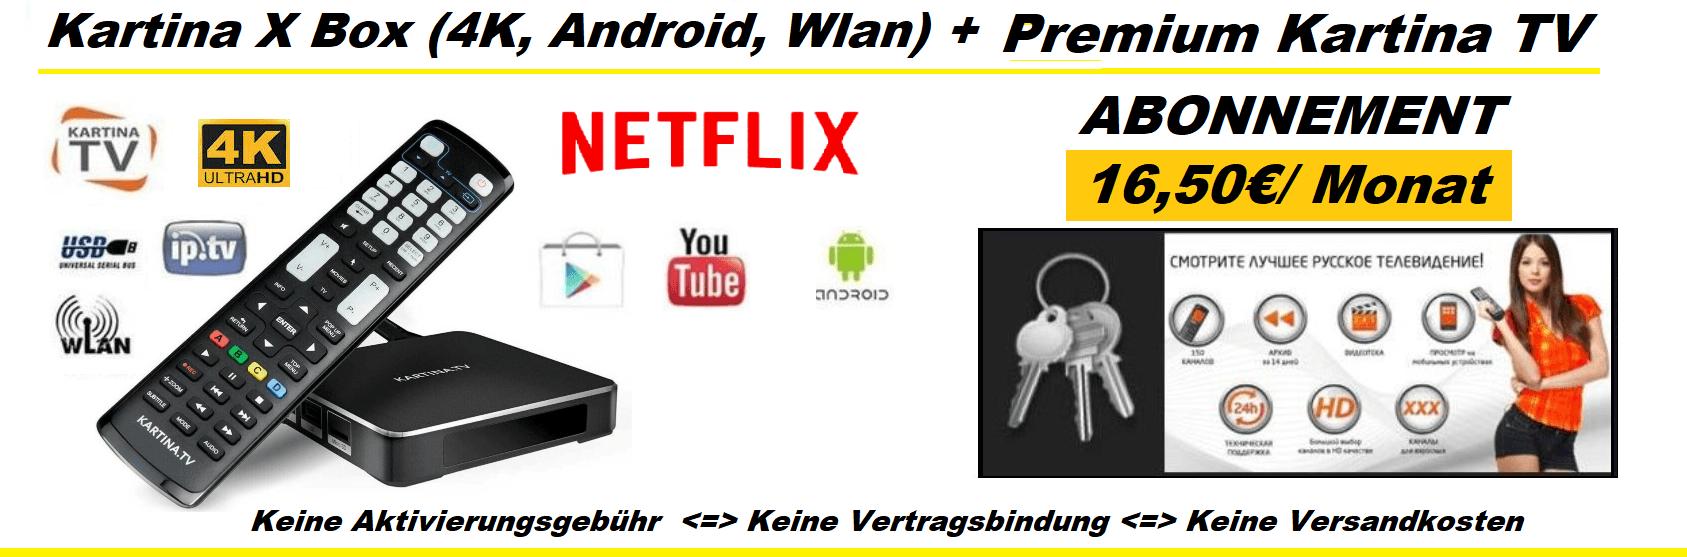 Kartina X 1650 Monat Kartina TV Premium Abonnement